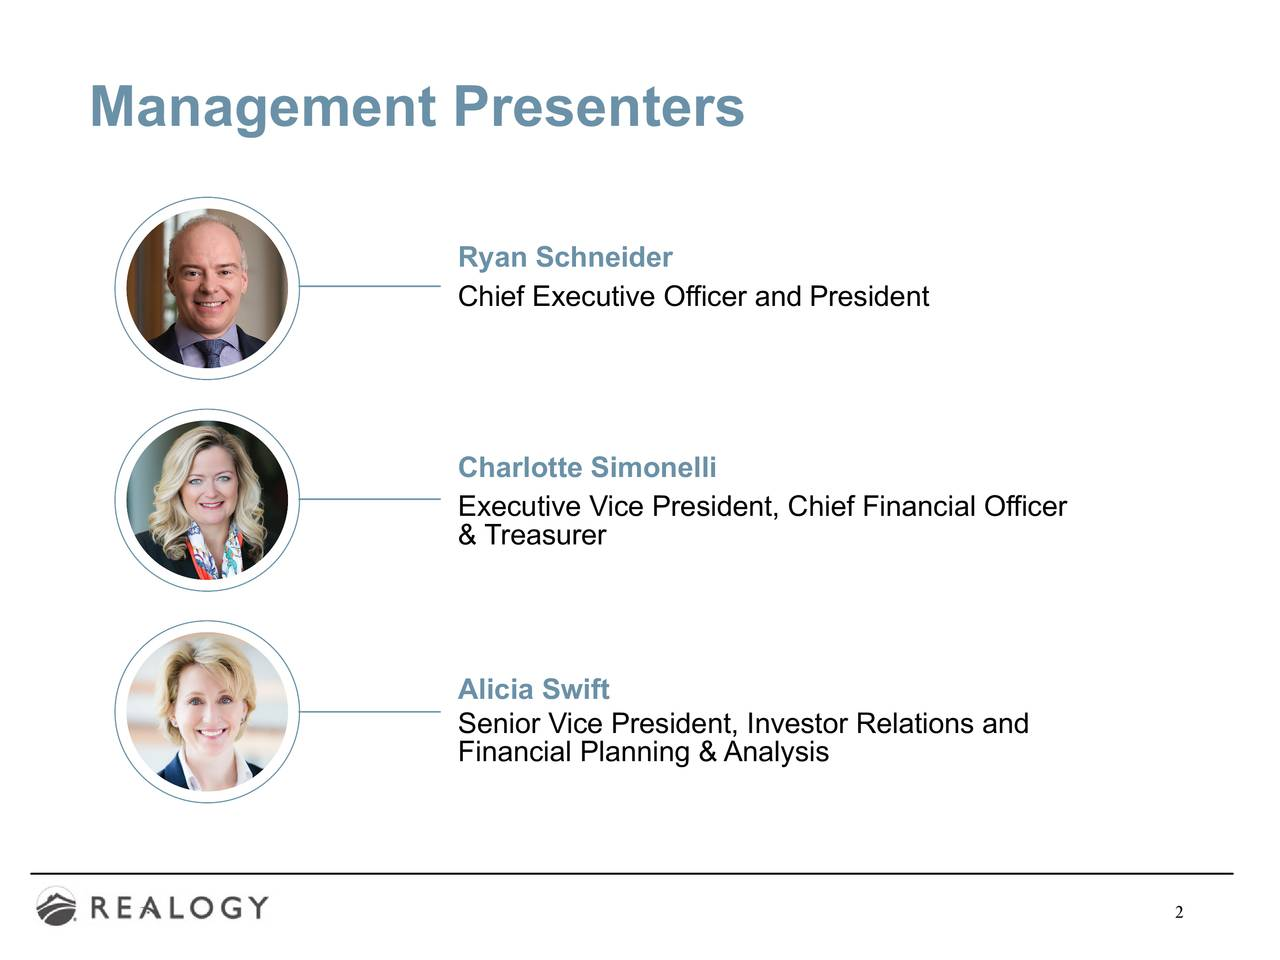 Management Presenters